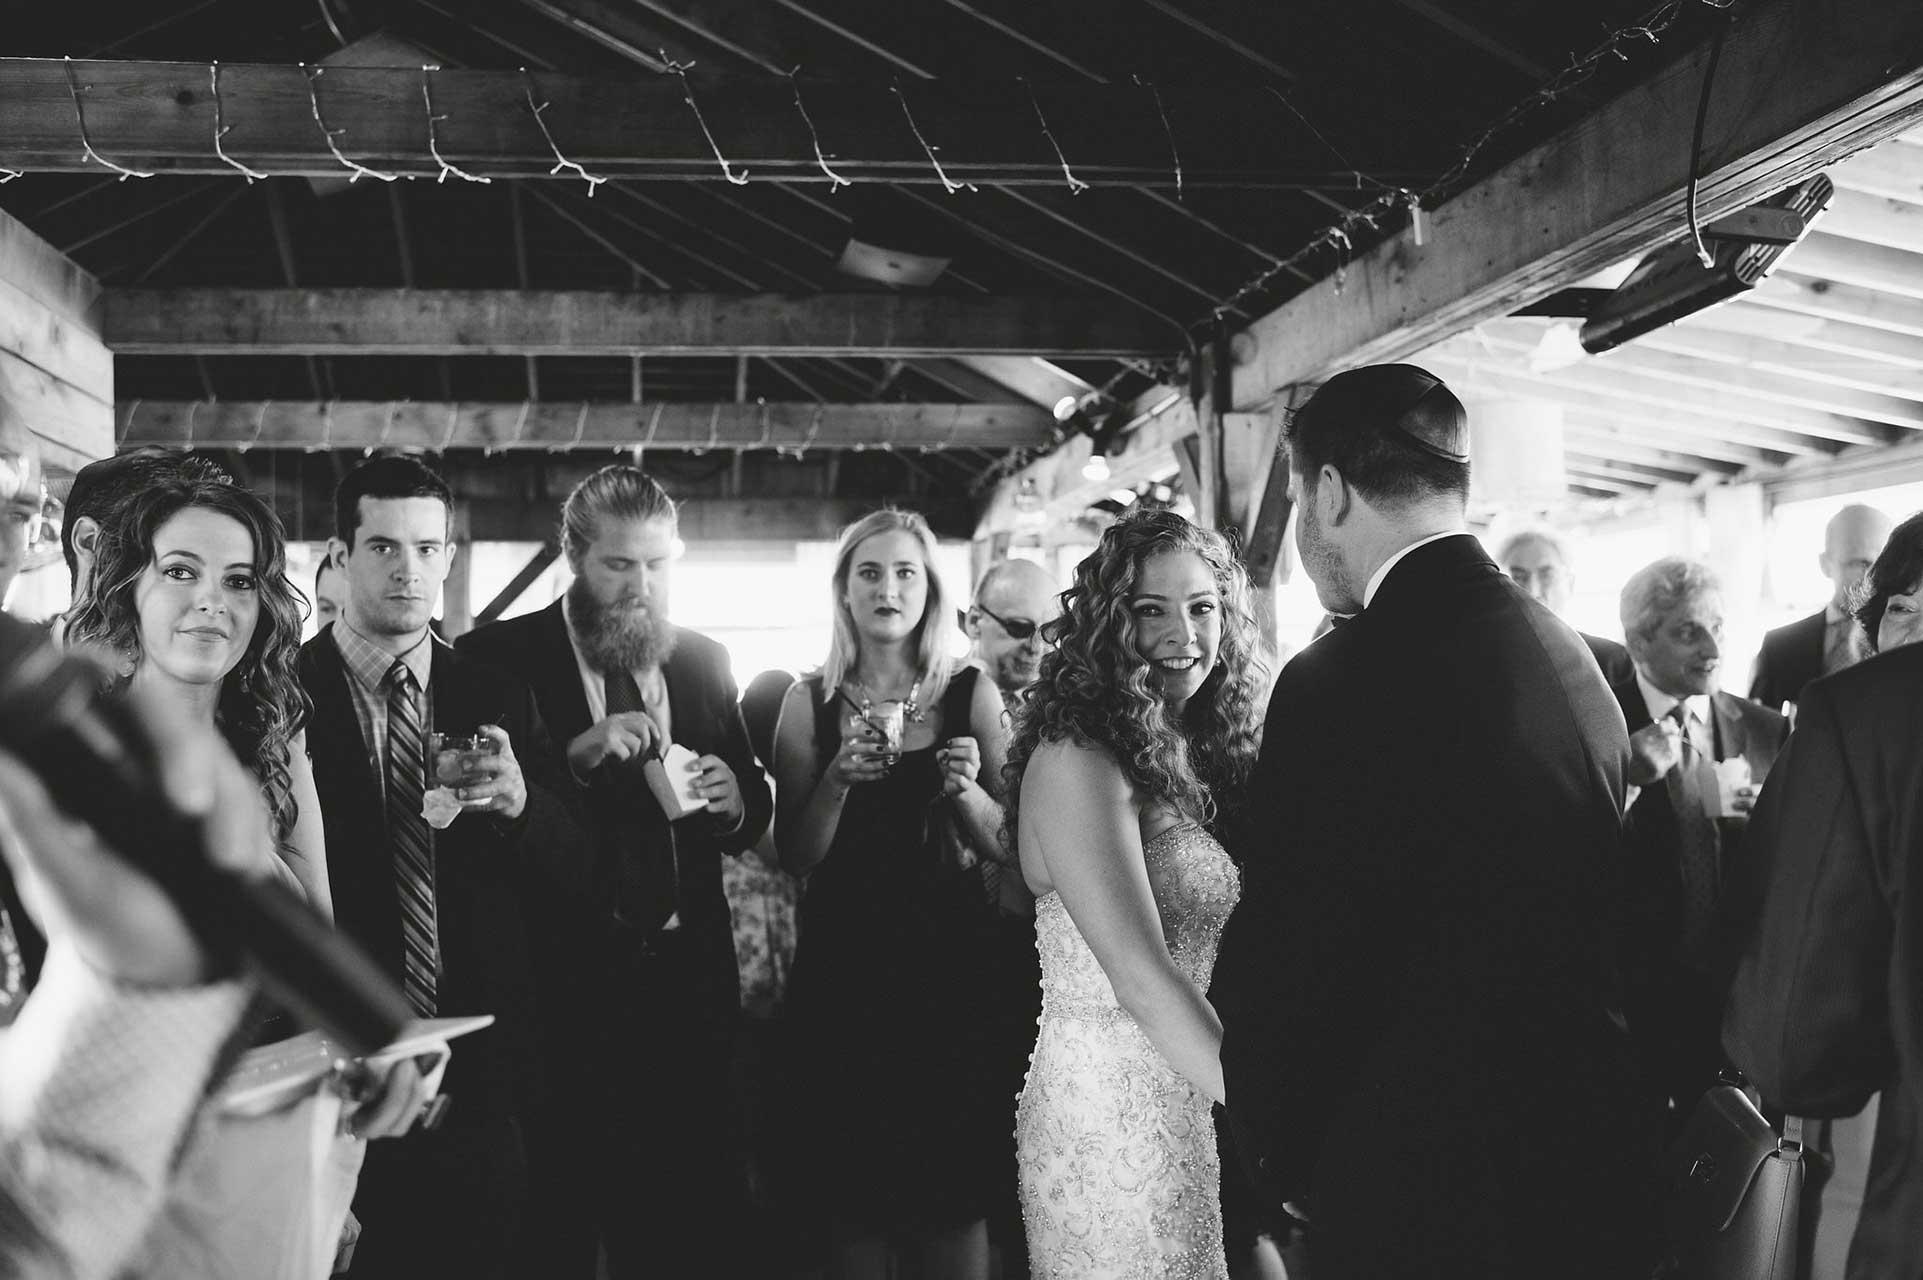 Toronto Wedding Venues - Rooftop Terrace - Cocktail Hour